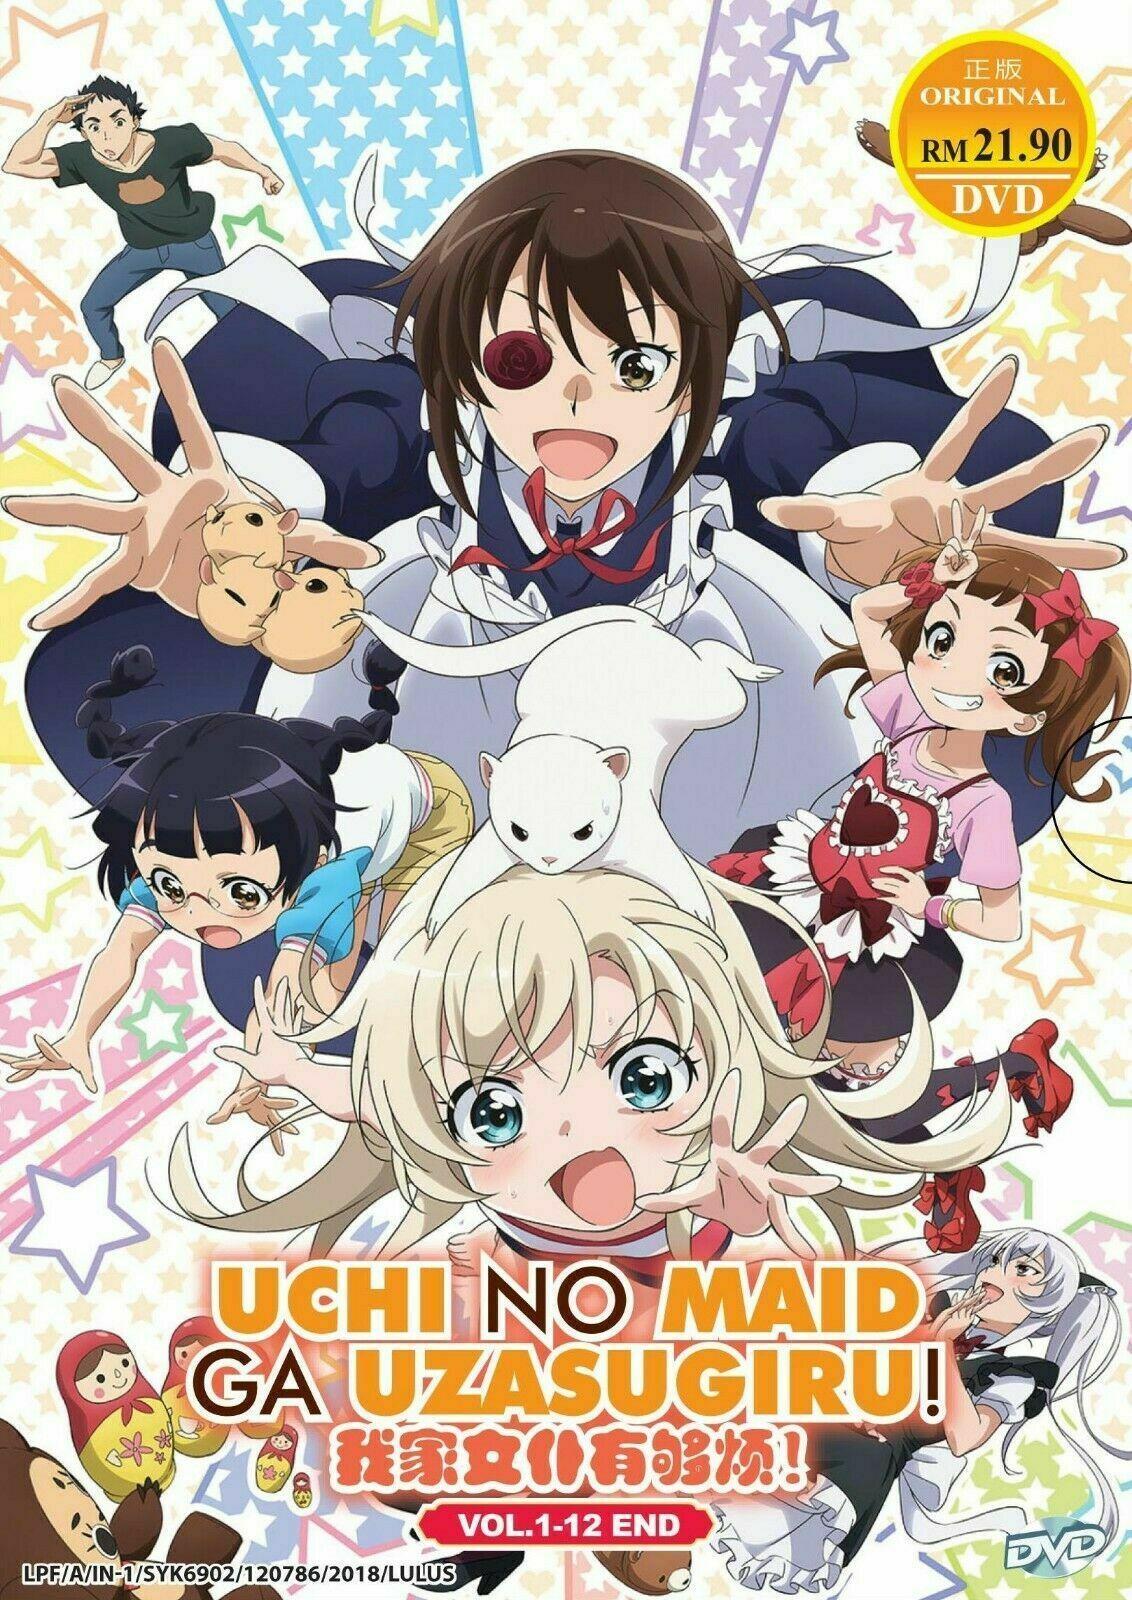 UCHI NO MAID GA UZASUGIRU ! VOL.1-12 END Anime Uzamaid